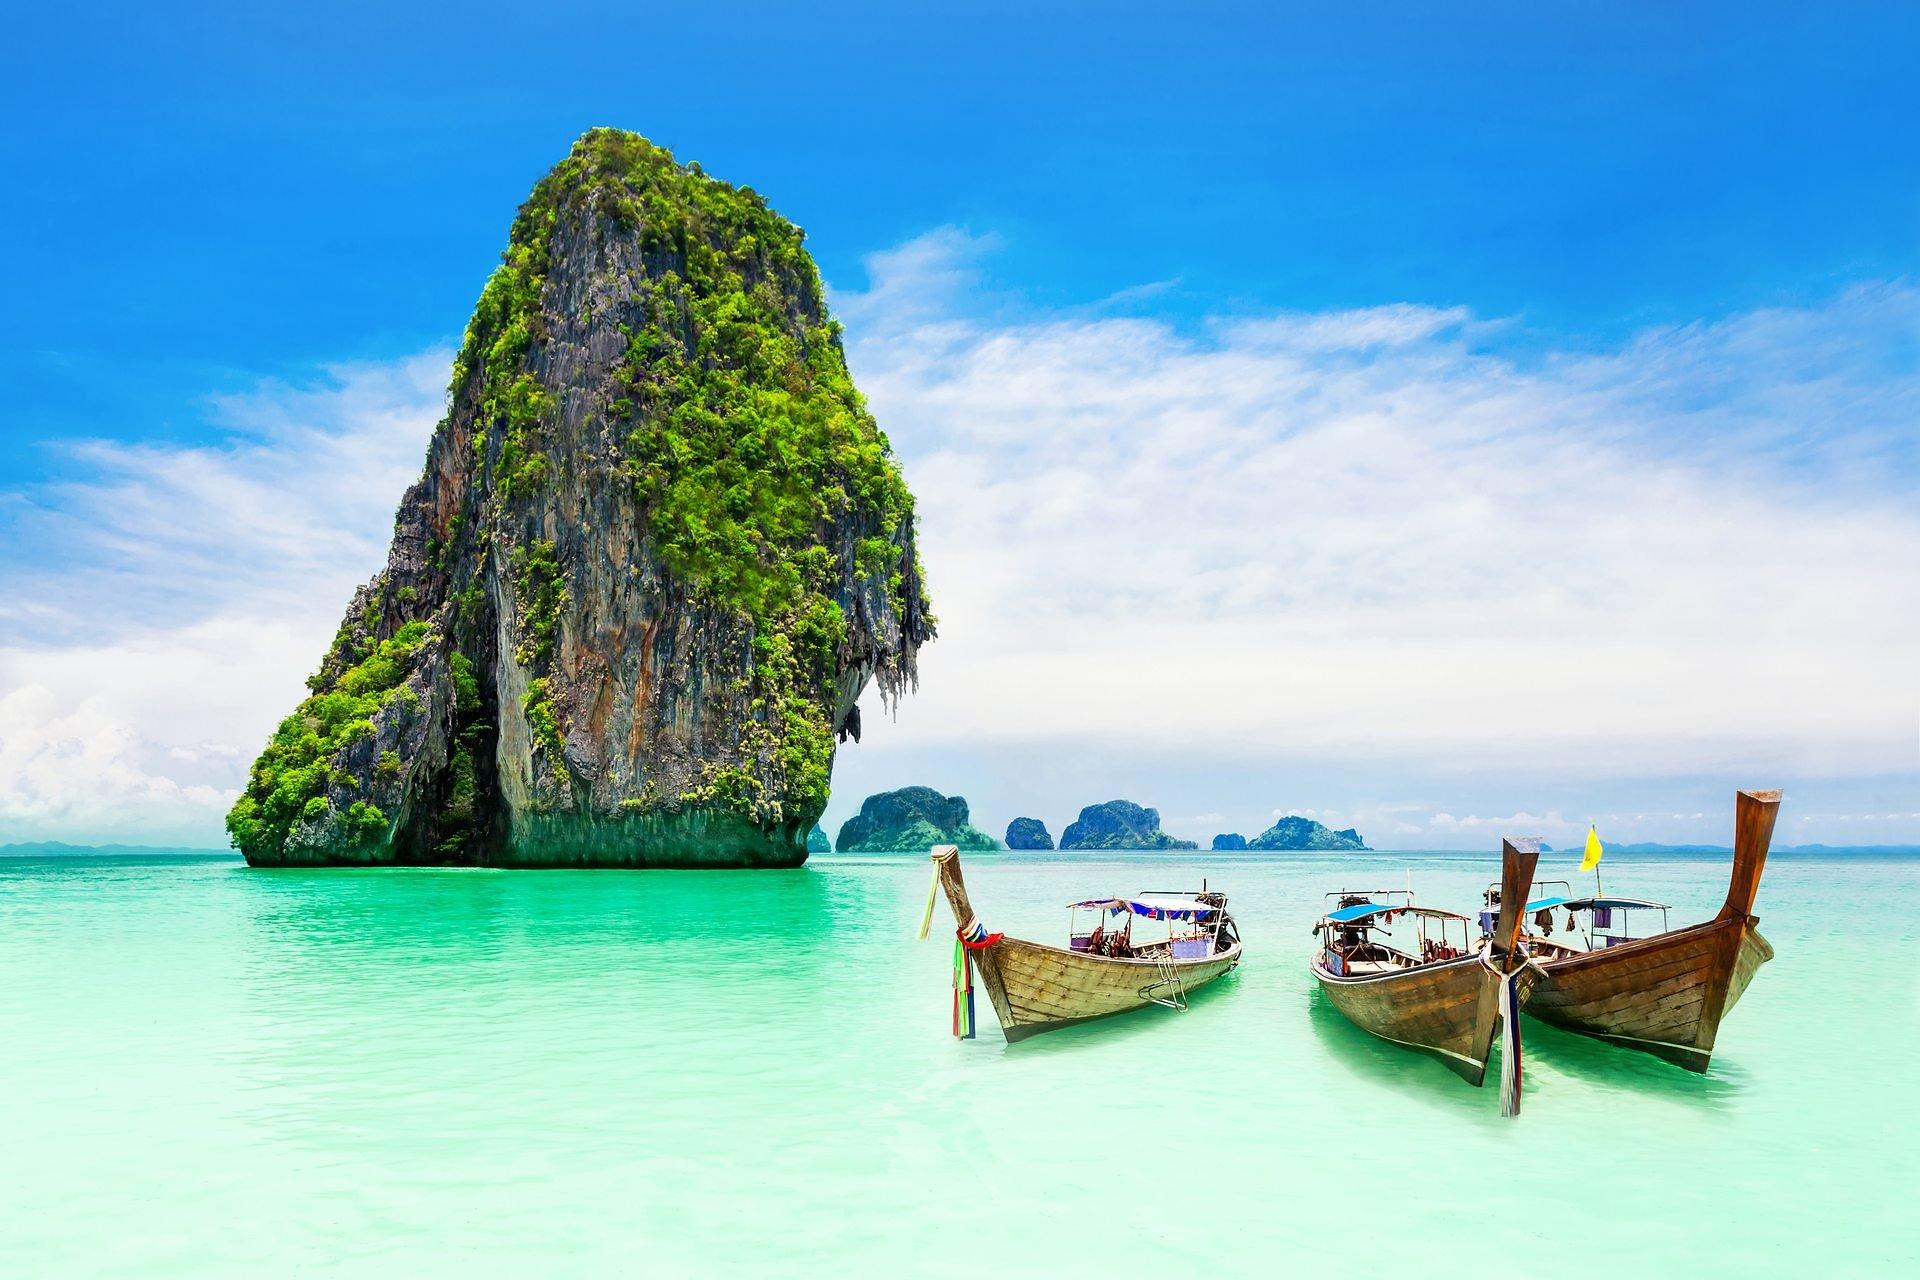 том, яркие картинки таиланда авто гаграх